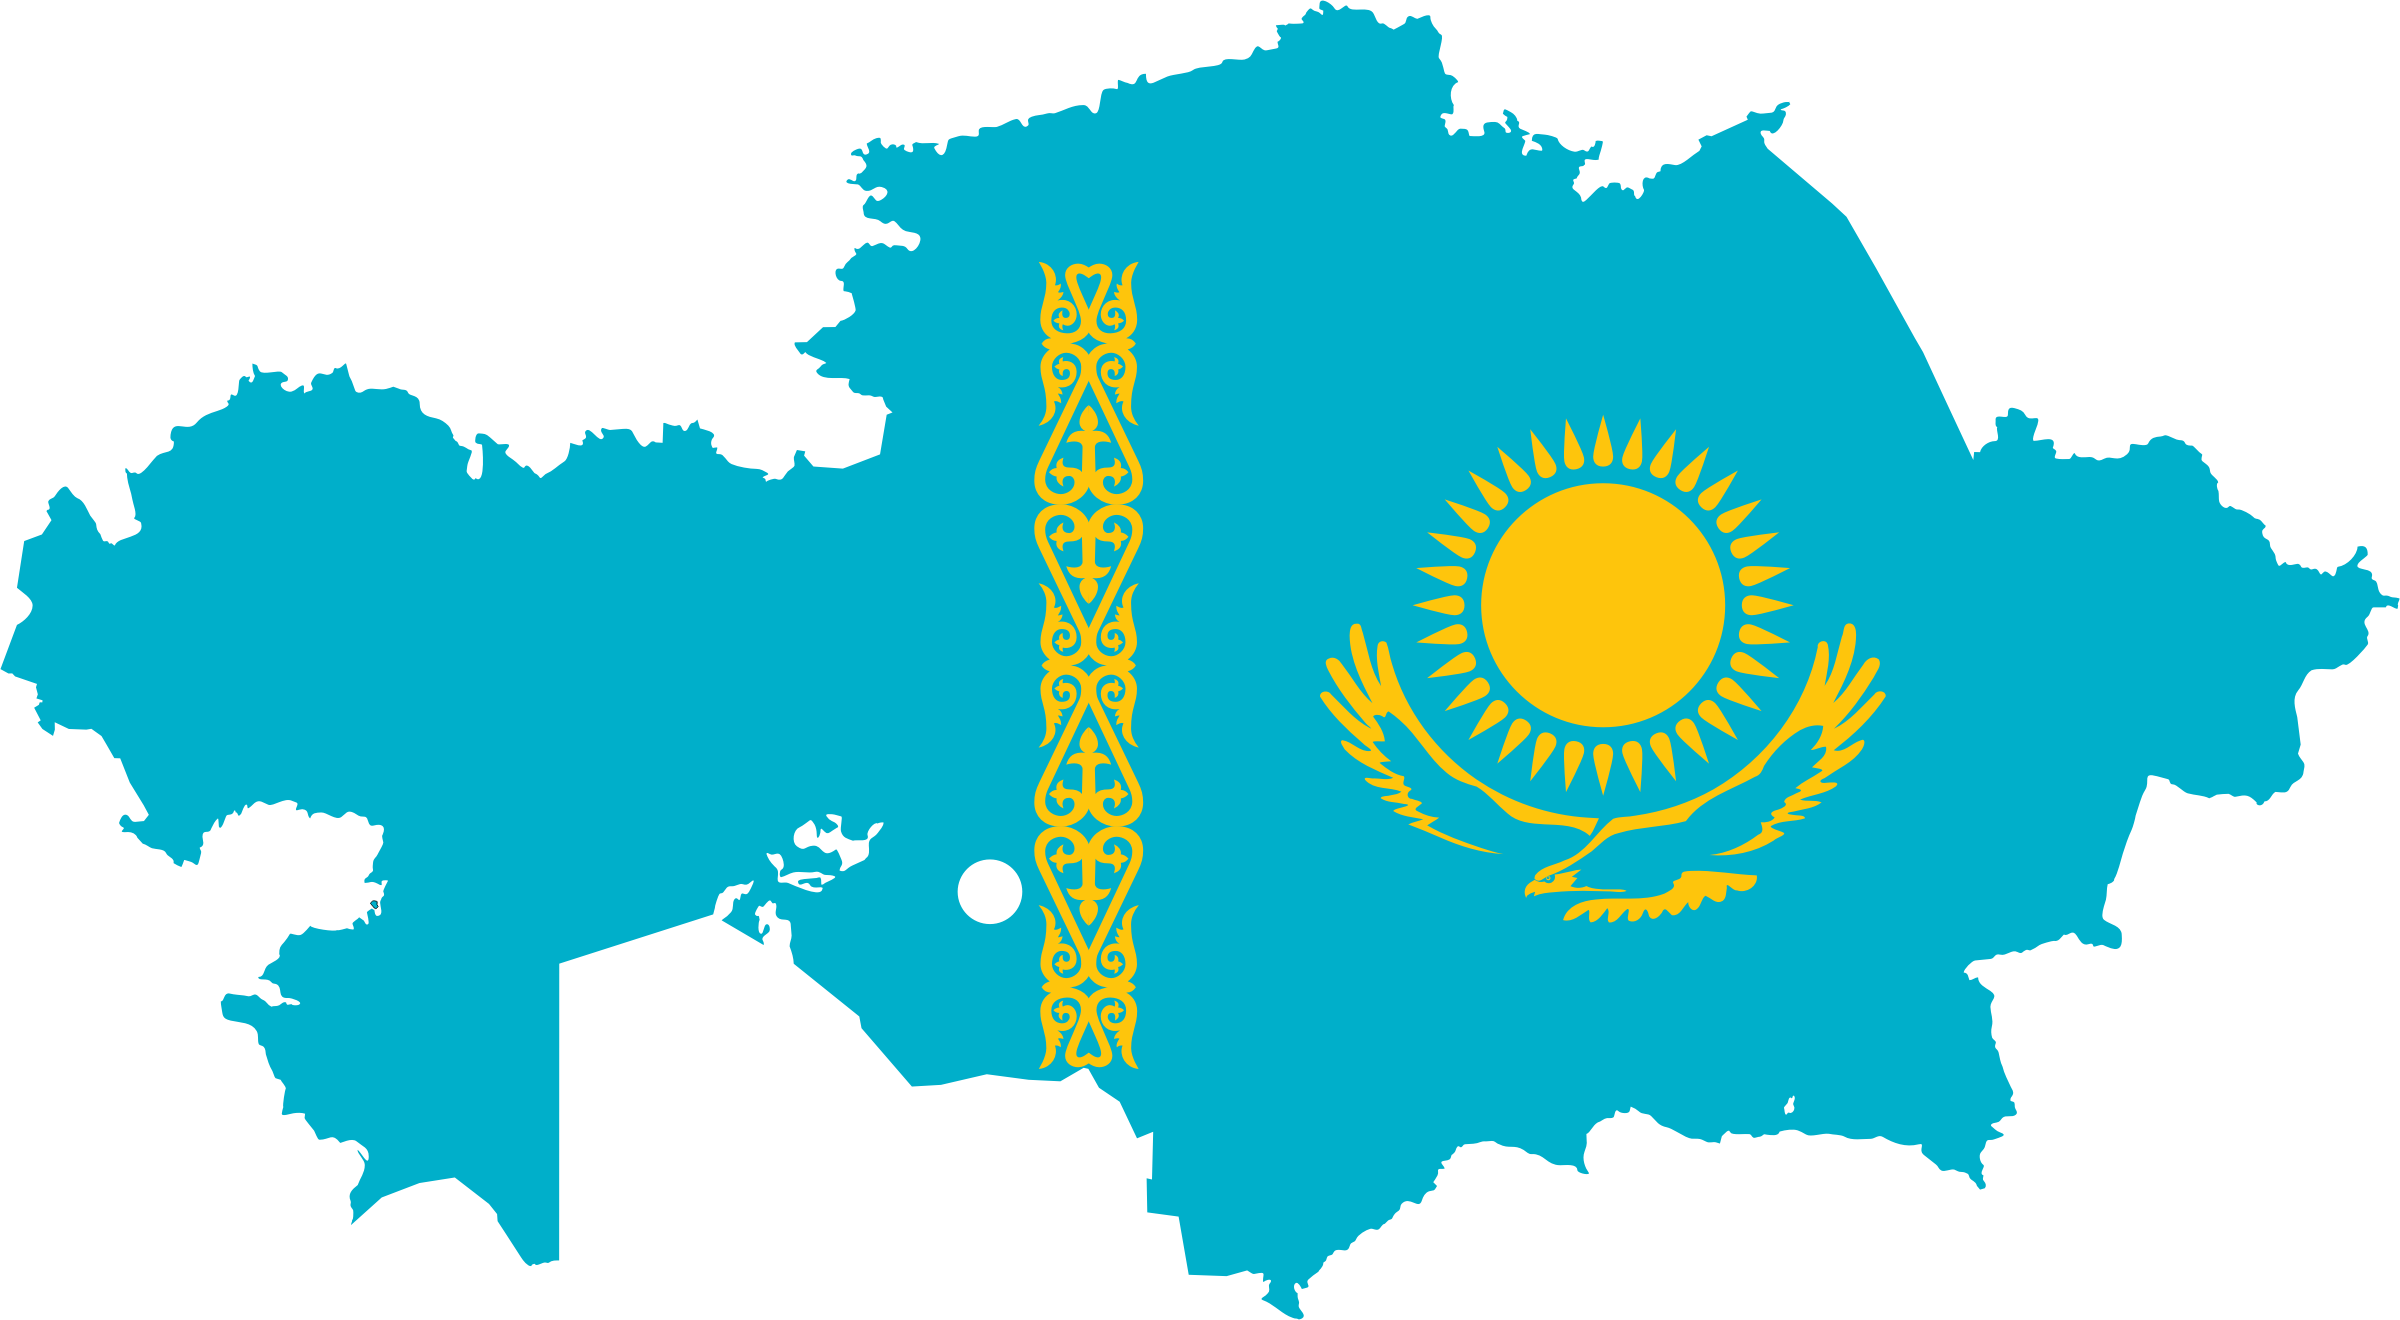 Kazakhstan clipart #17, Download drawings